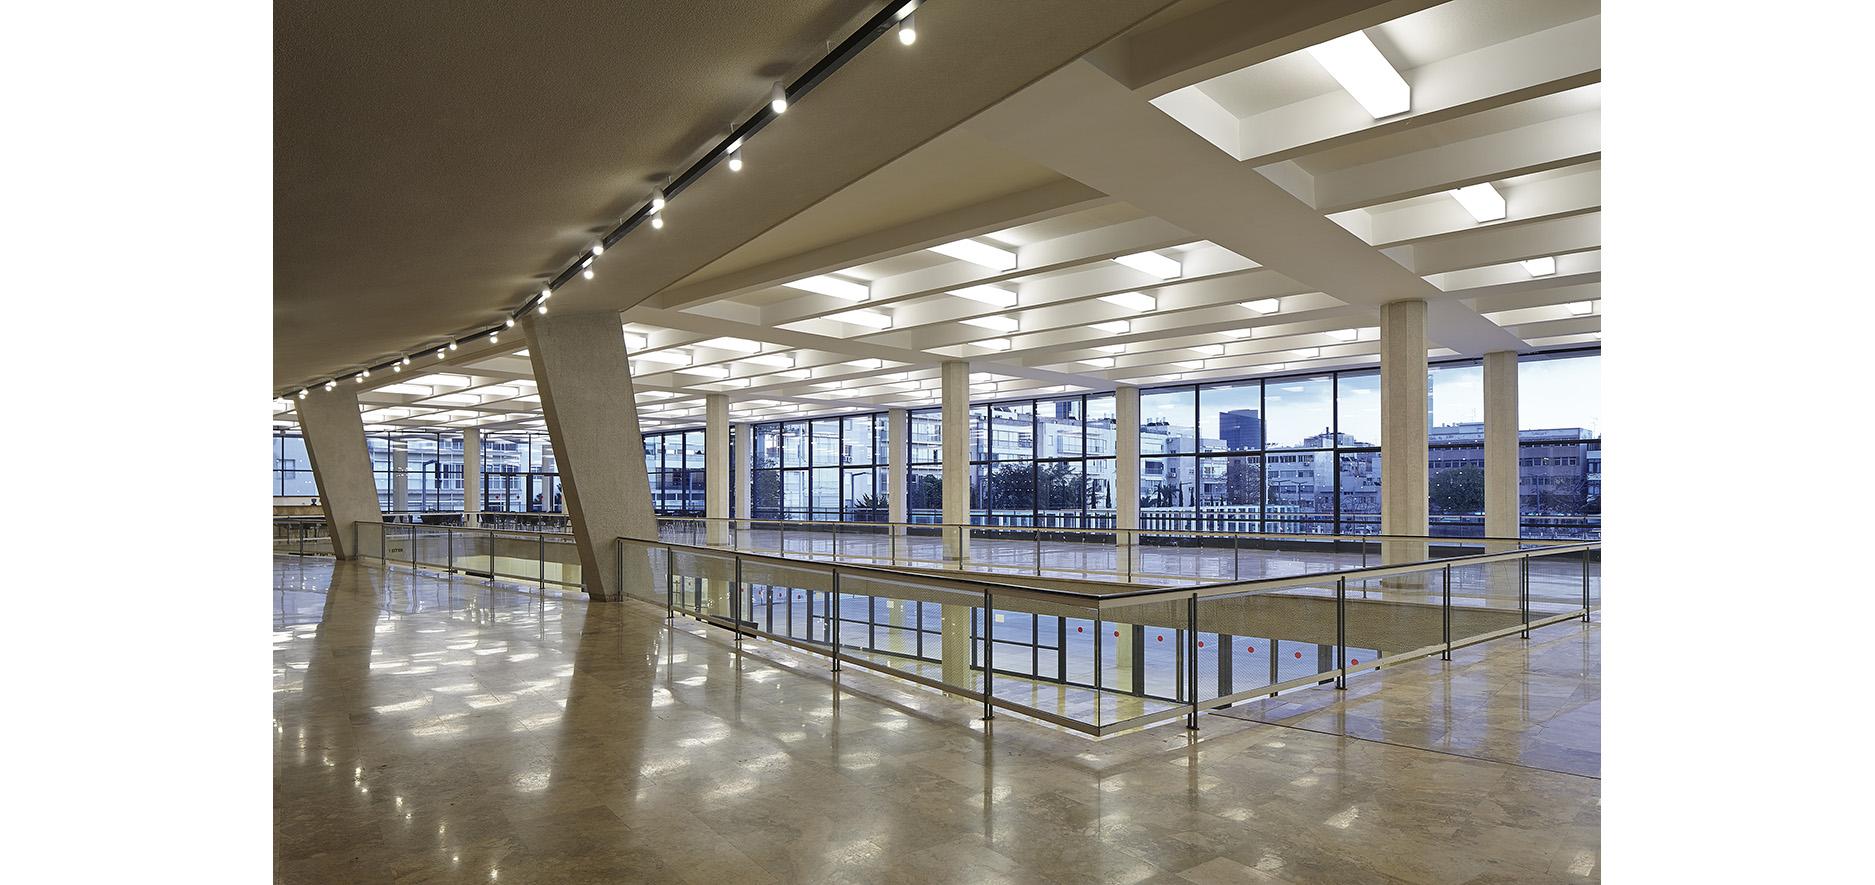 Heichal_HaTarbut_TLV_By_Kolker_Epstein_Architects004